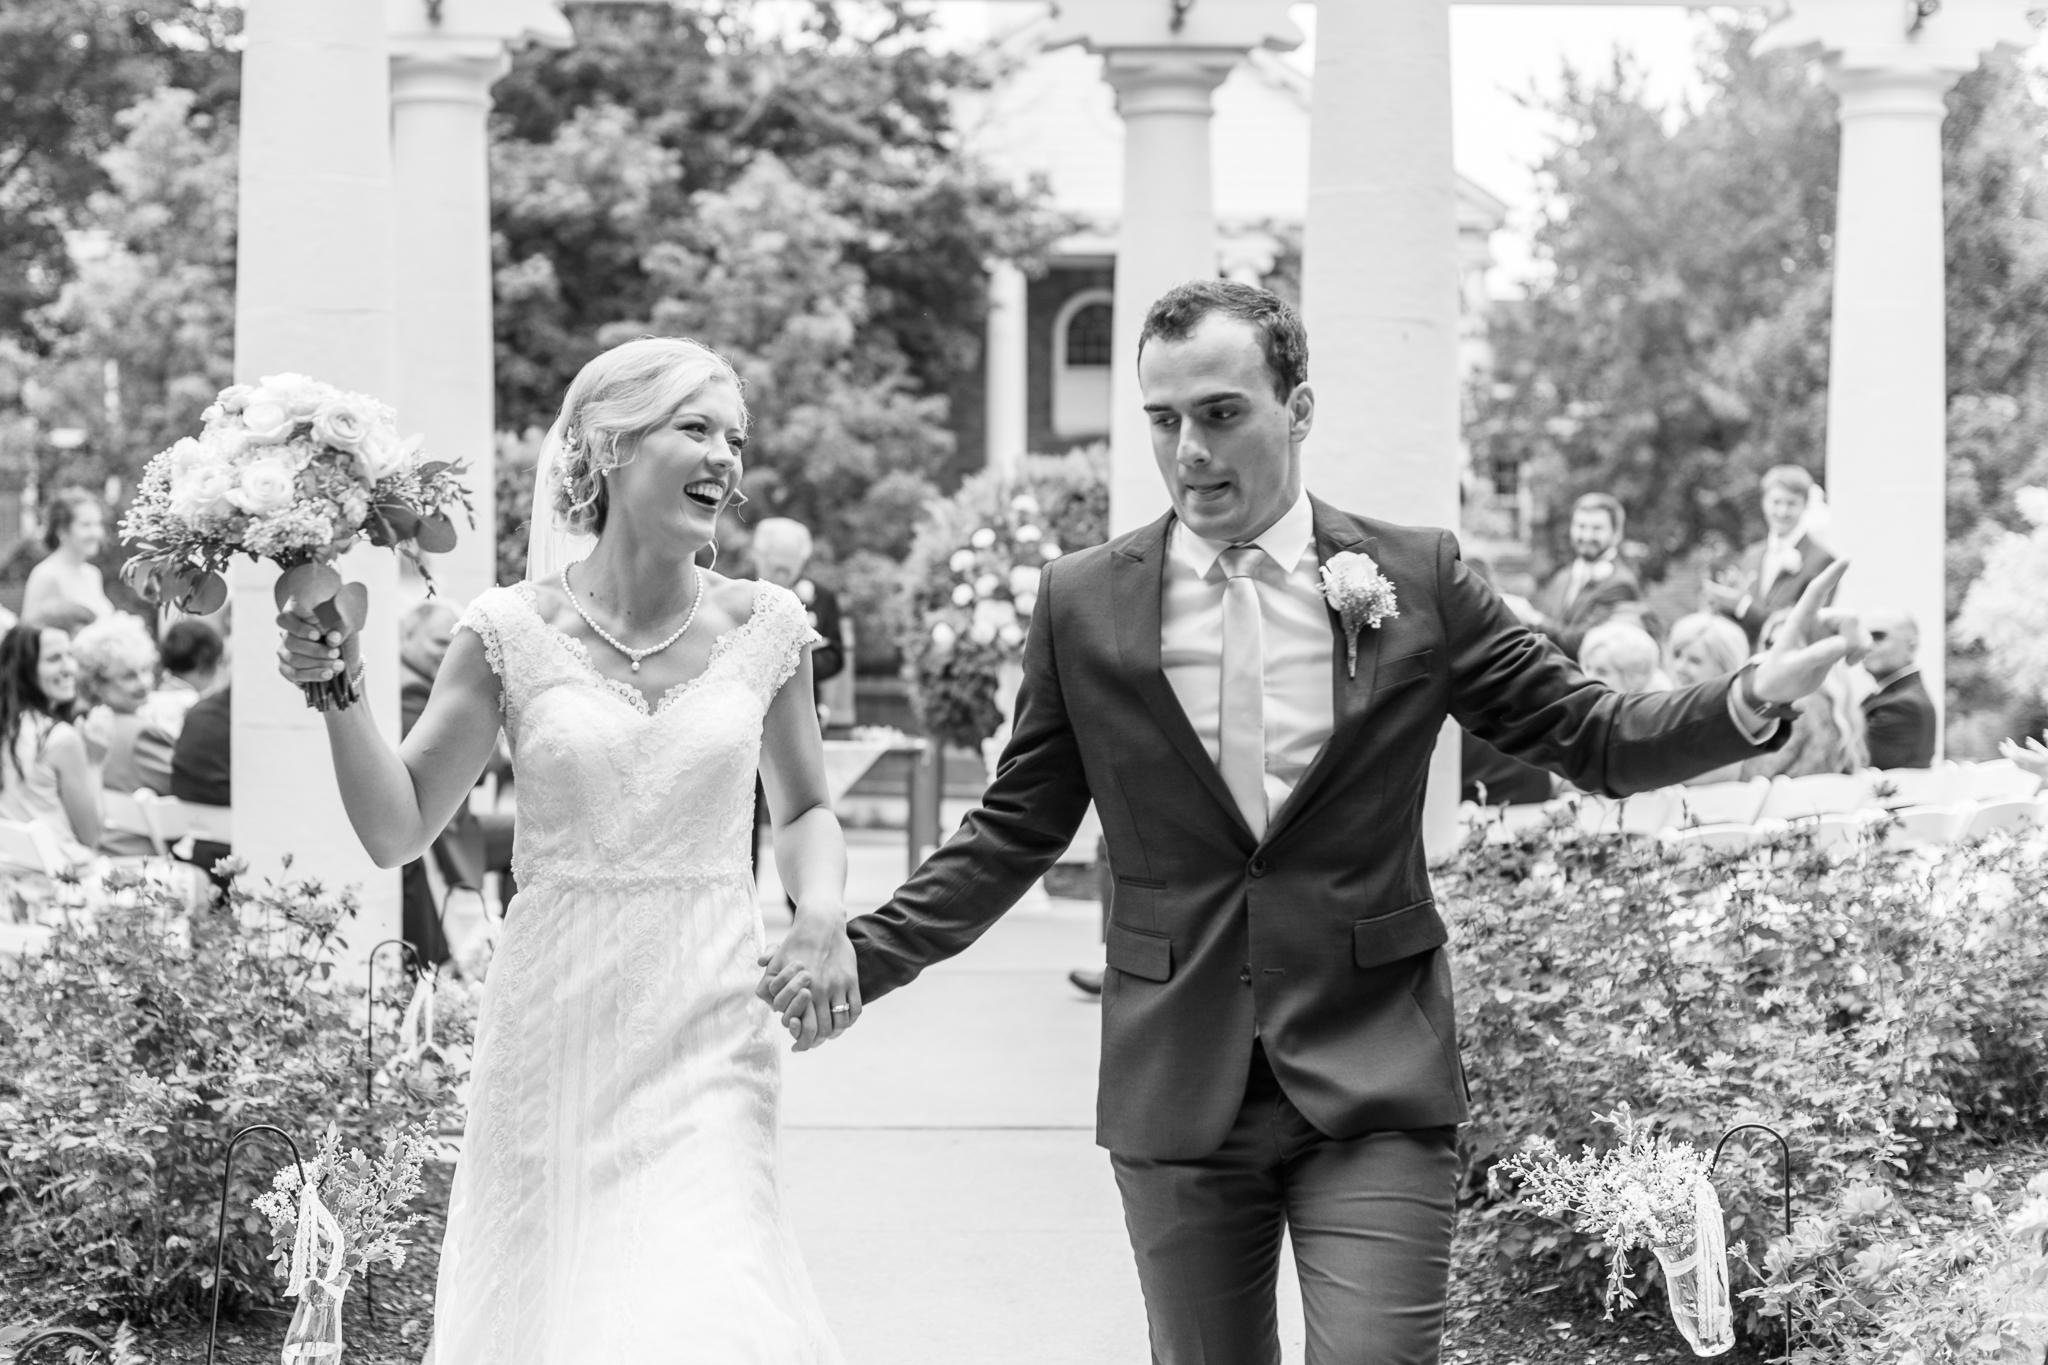 Westminister Hall Wedding Winona Lake Indiana9630.jpg